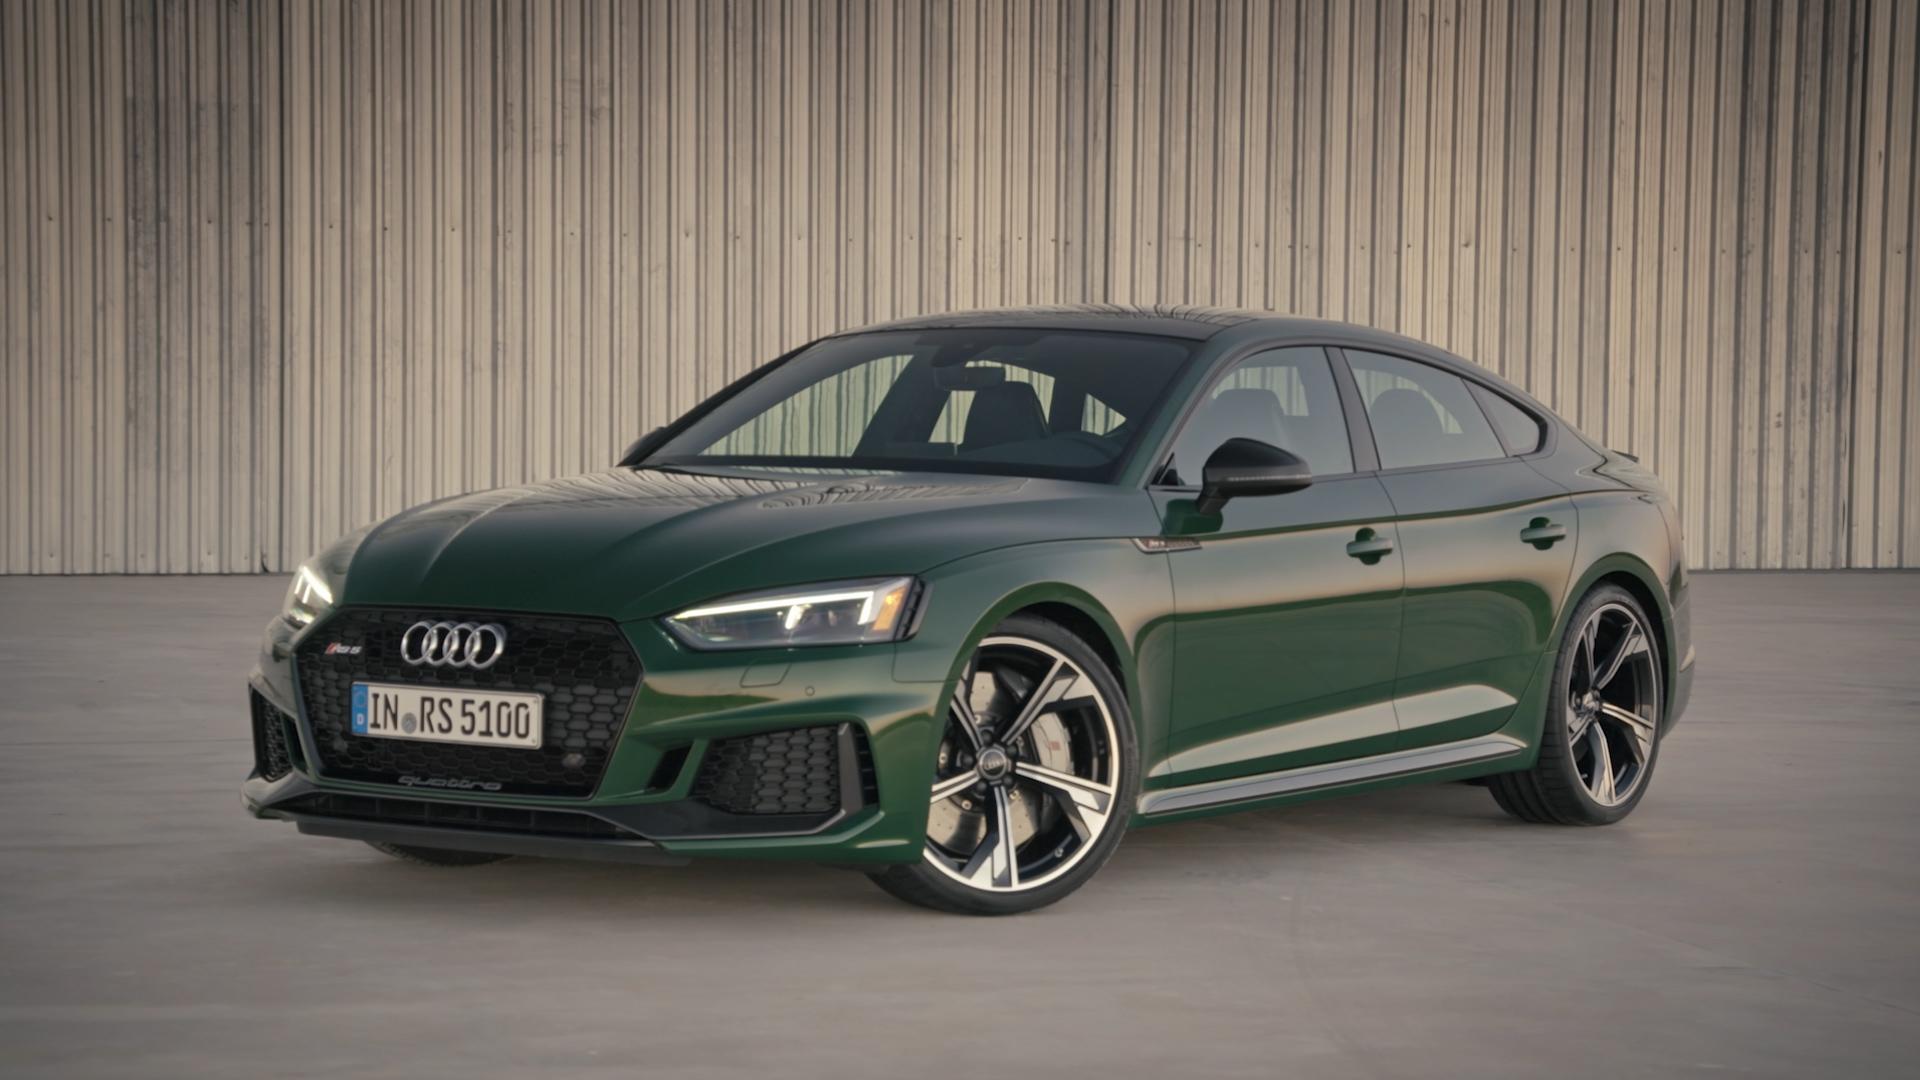 Optimum performance: the new Audi RS 5 Sportback